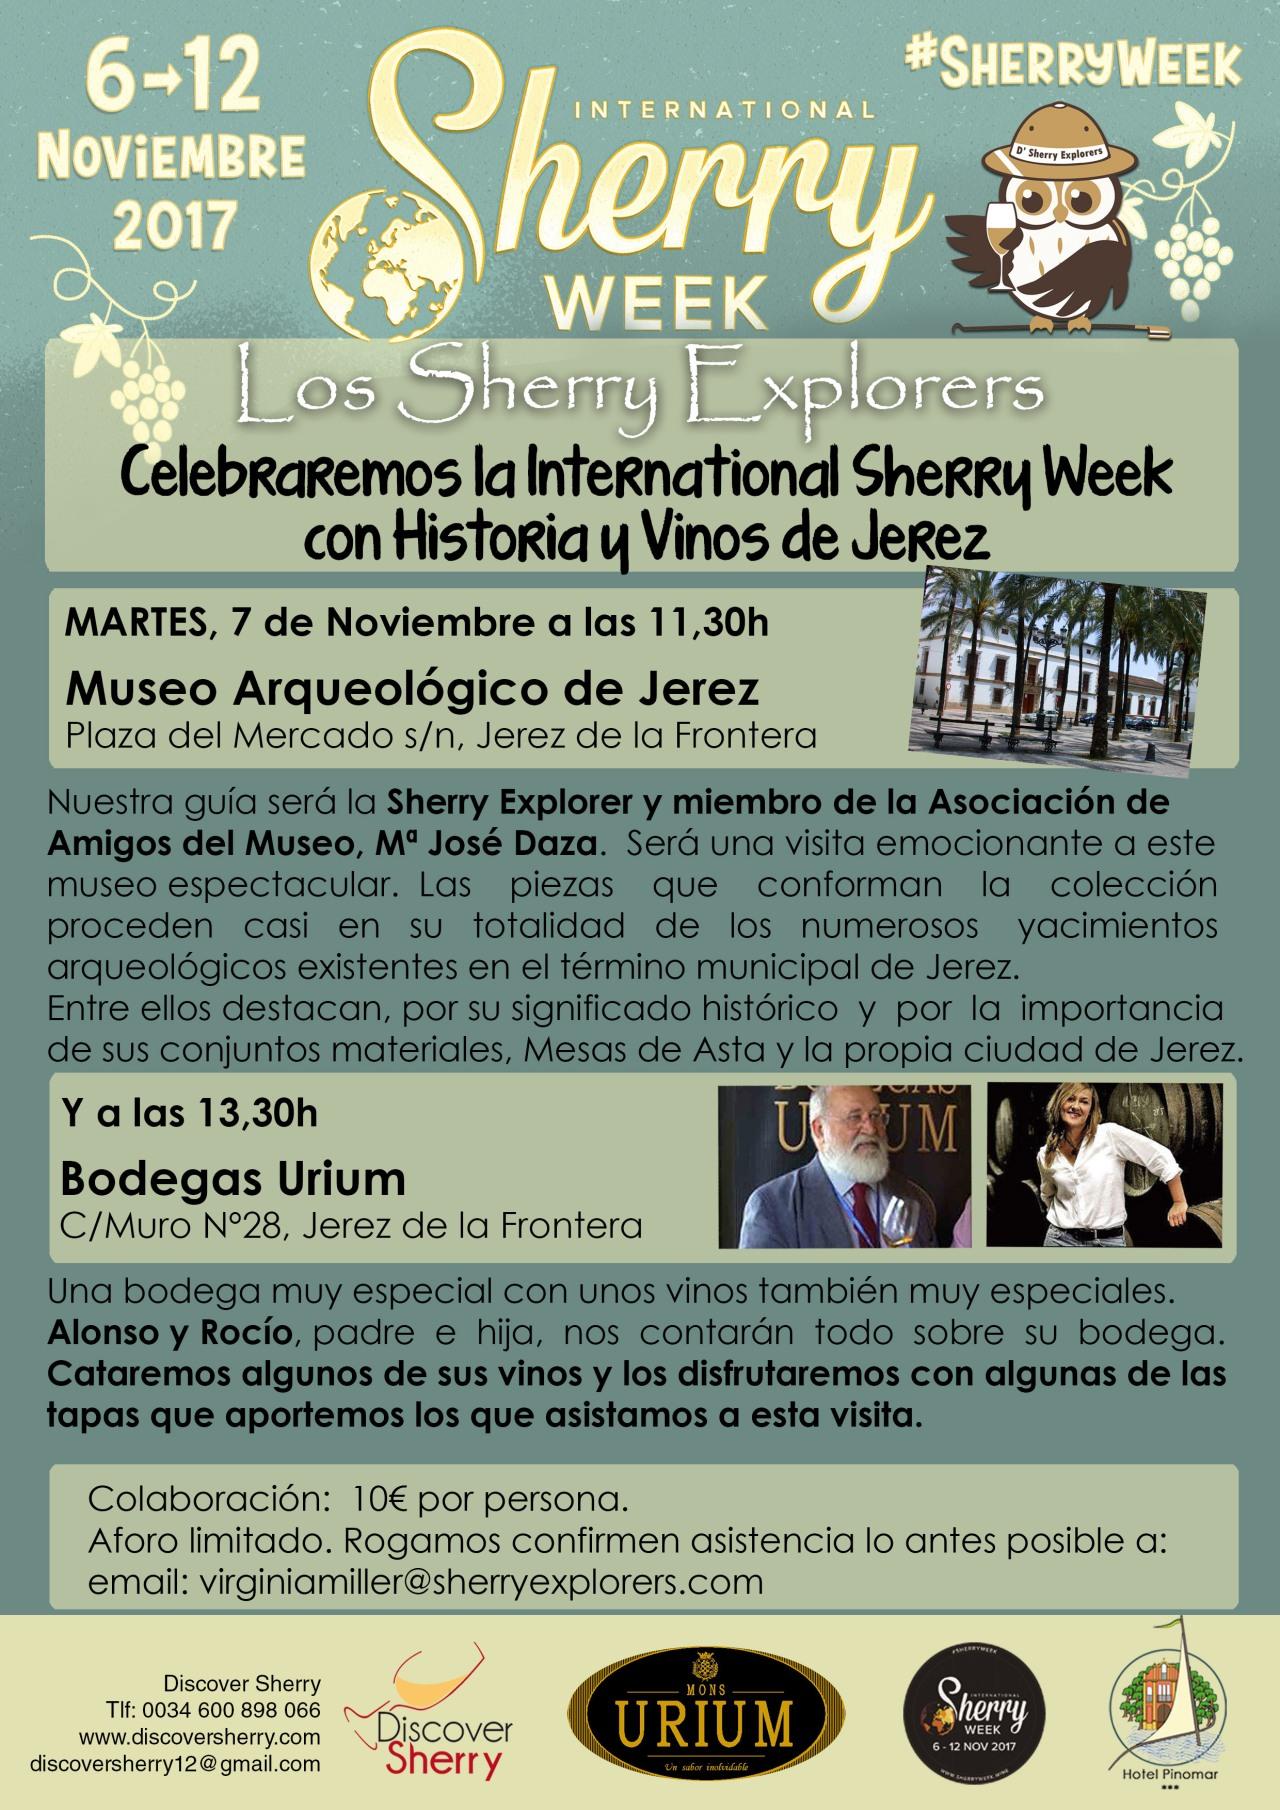 International Sherry Week: D´Sherry Explorers visitan el Museo Arqueológico y la Bodega Urium.(Spanish)